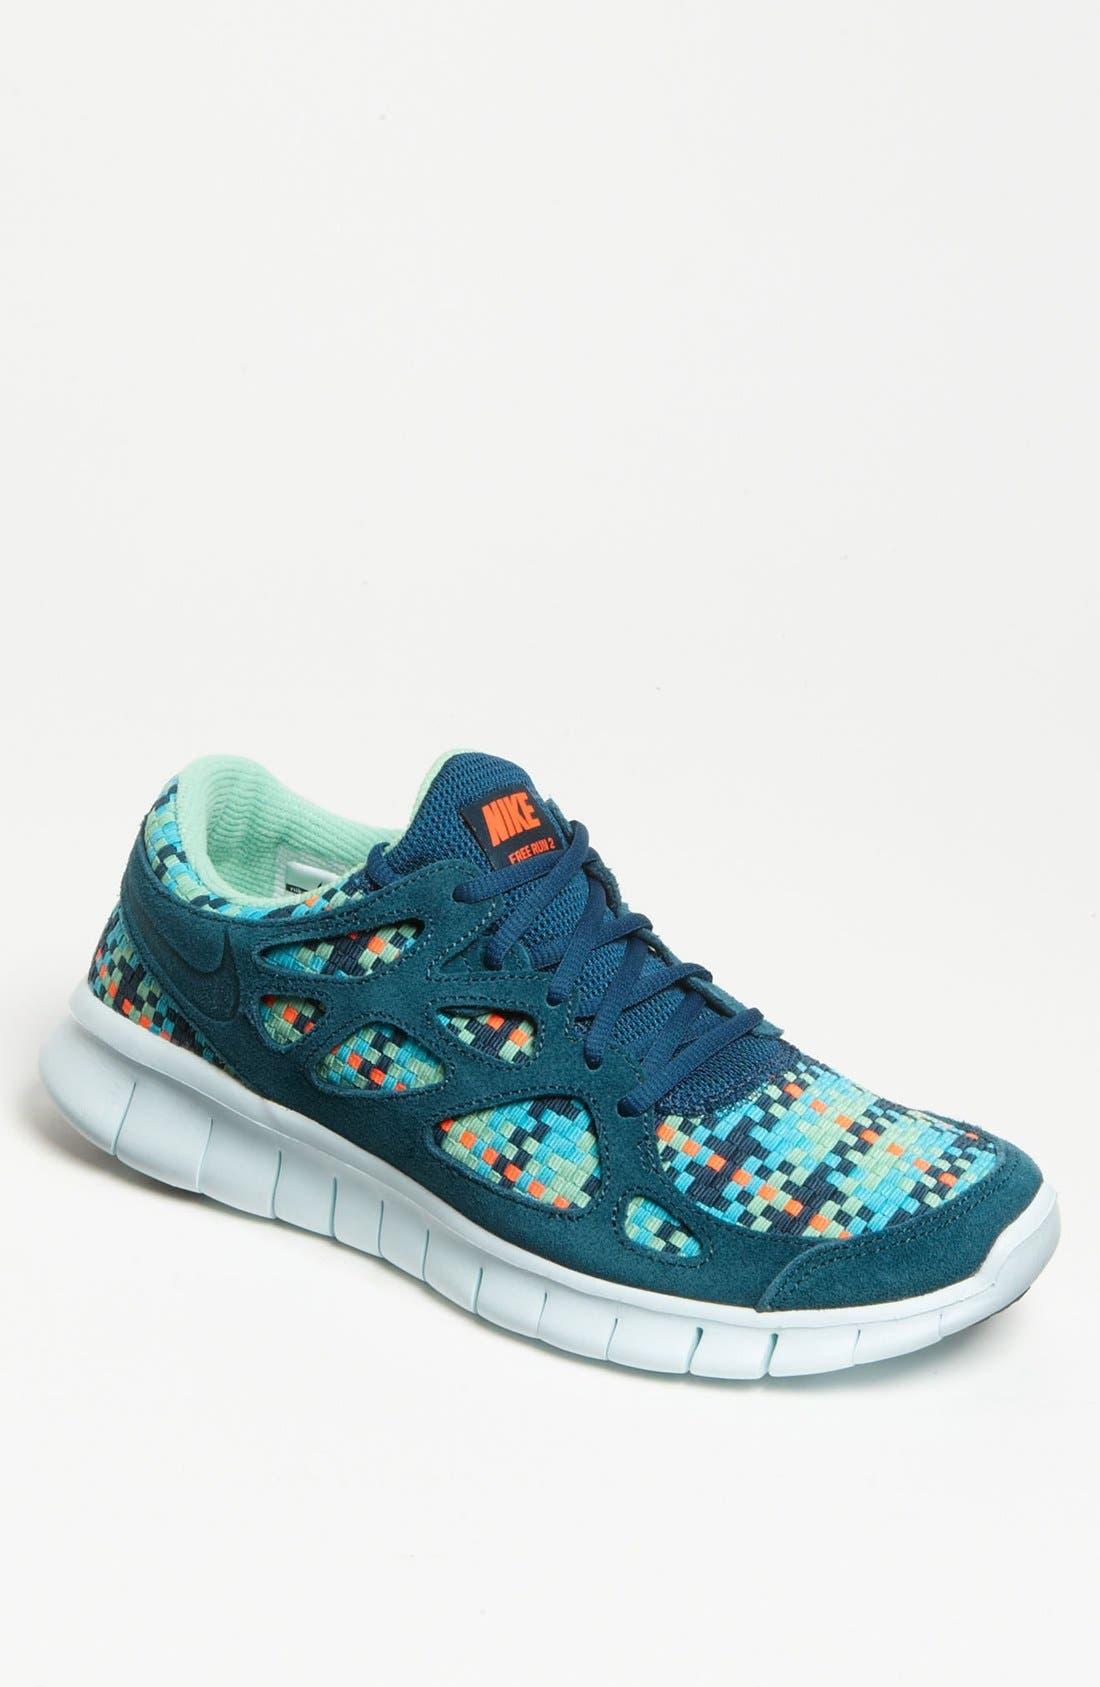 Nike Free Run 2 Sarcelle Literie Blanche